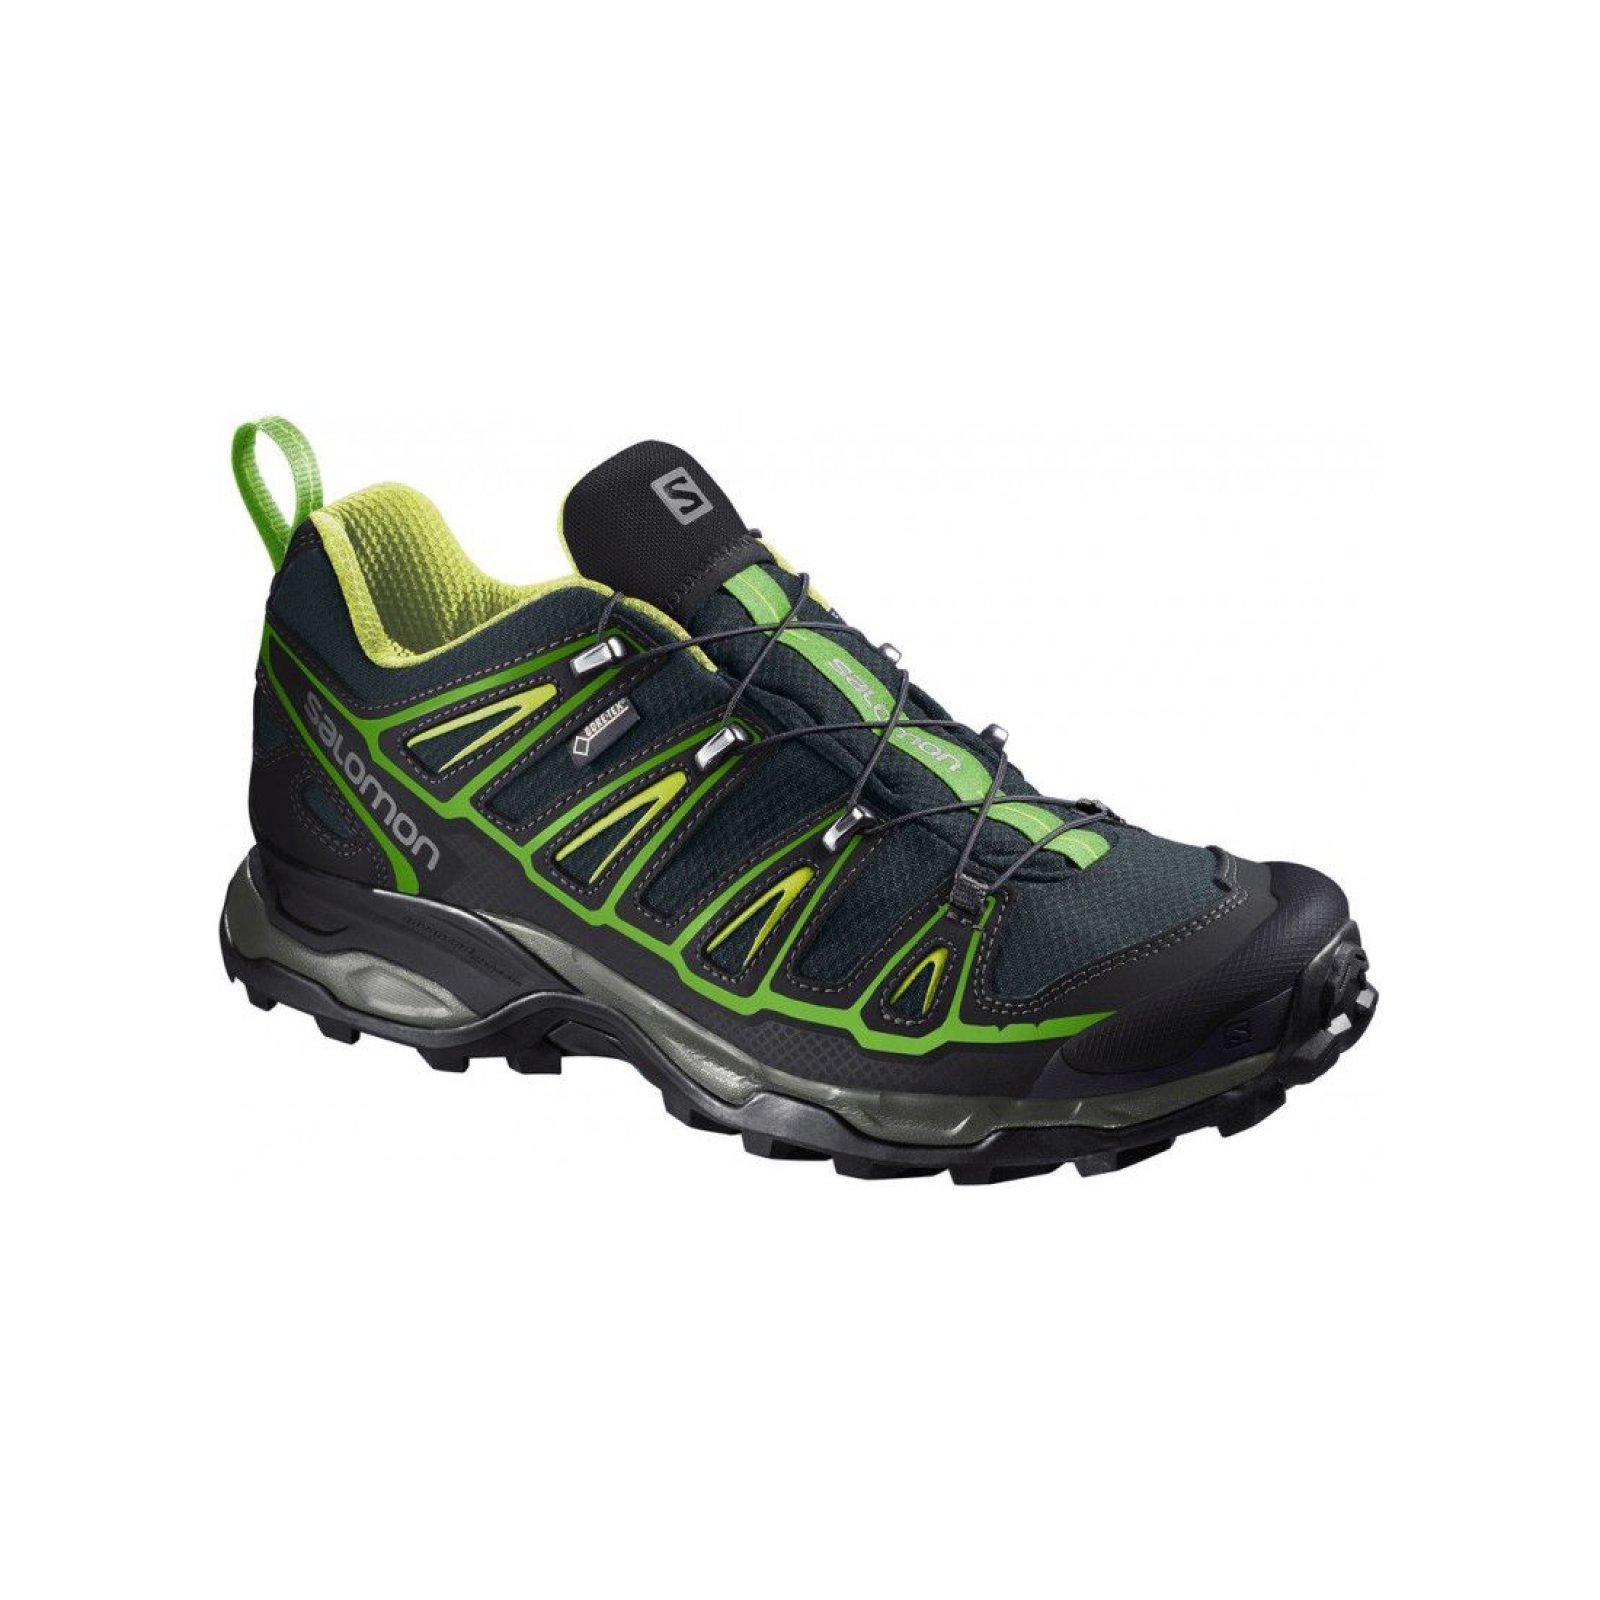 cb1be3b7b05 Pánska obuv salomon X ULTRA 2 GTX L391840